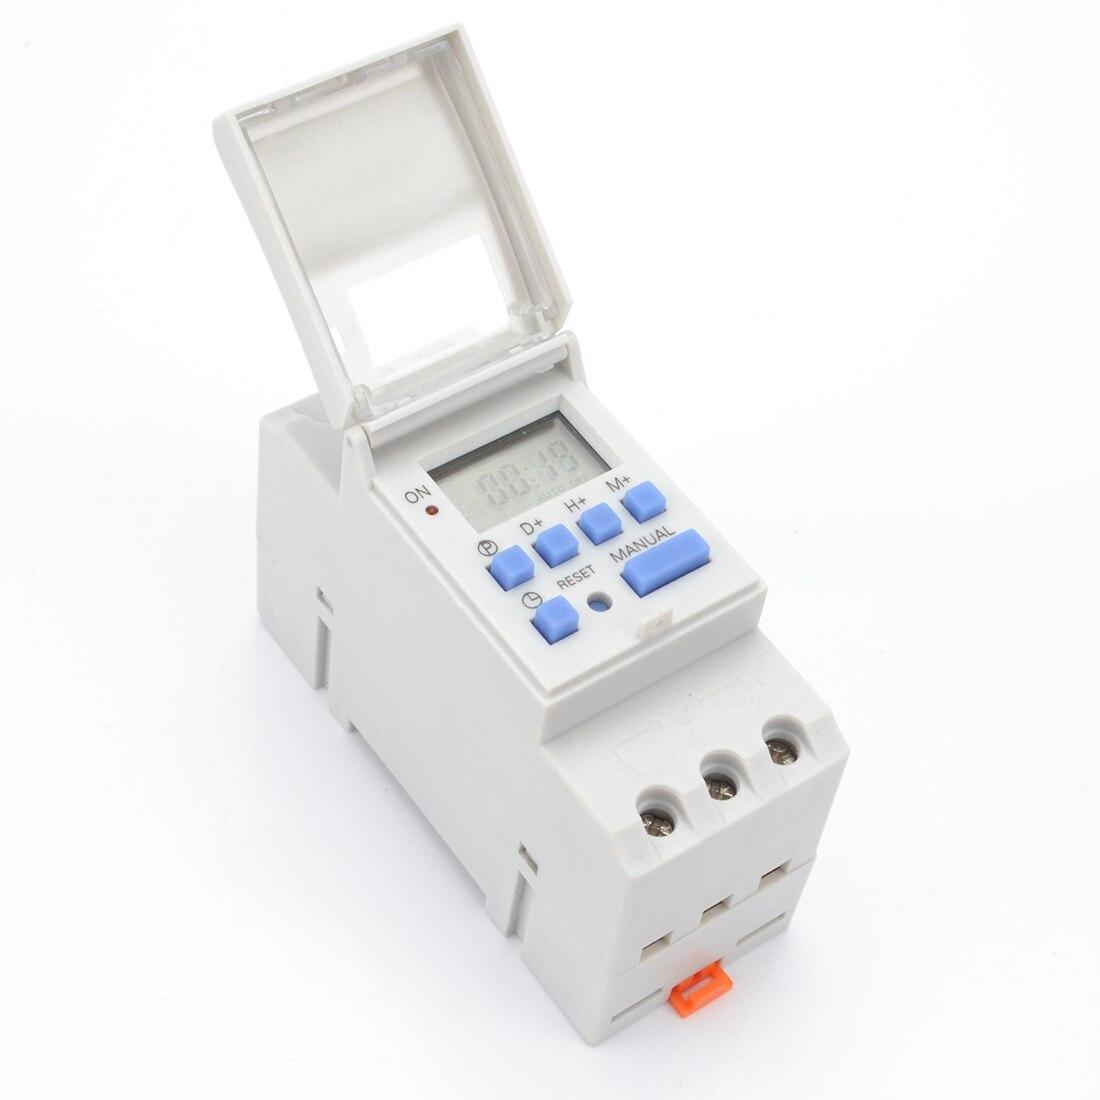 1pc Digitale Programmierbare 7 DaysTimer Schalter AC 220V 110V 230V DC 12V 16A Temporizador Schiene timer SwitchProgrammable Digital